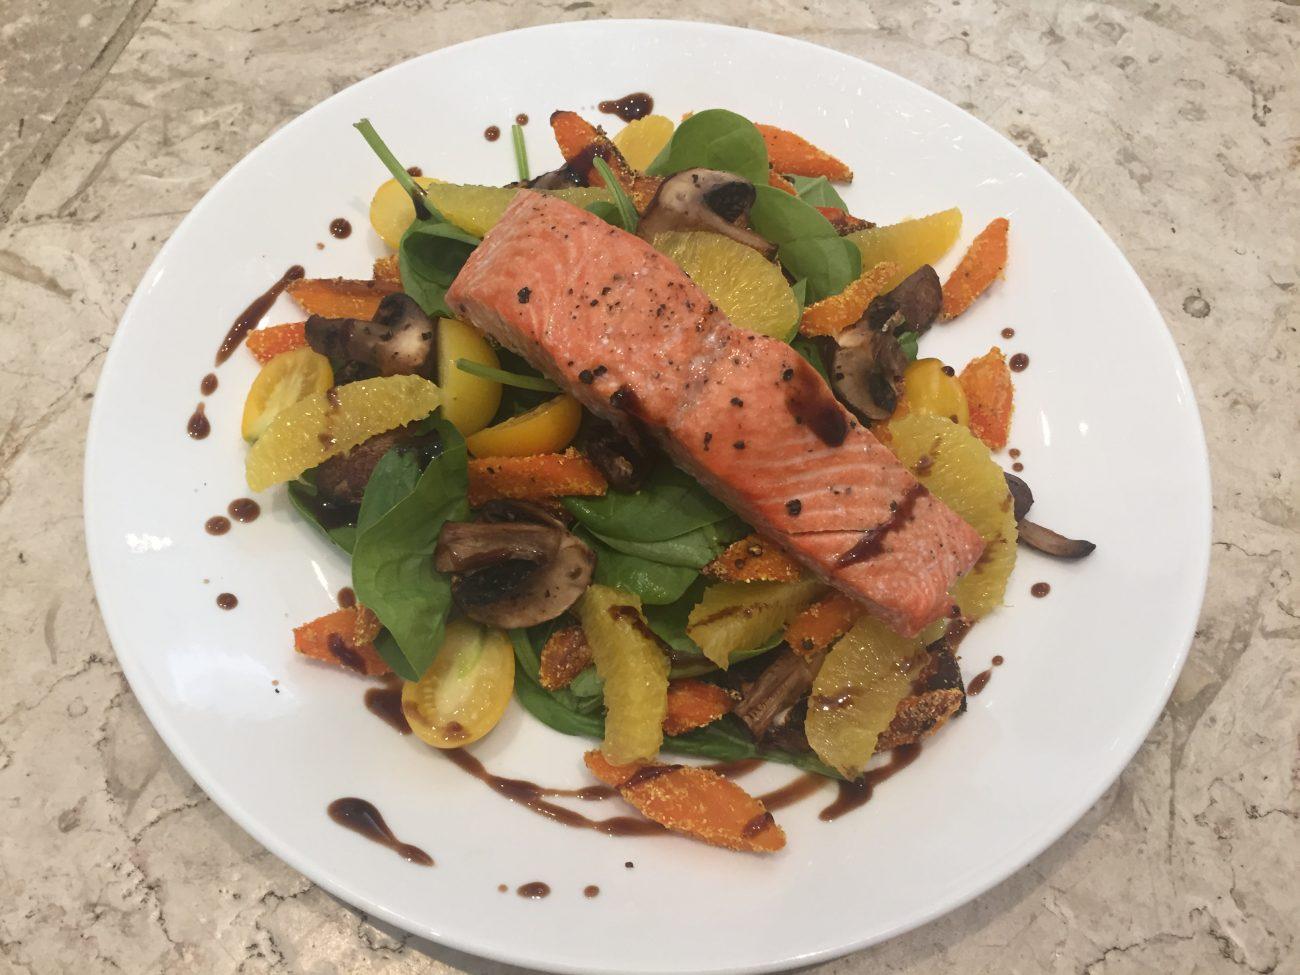 Salmon, Carrot and Orange Salad